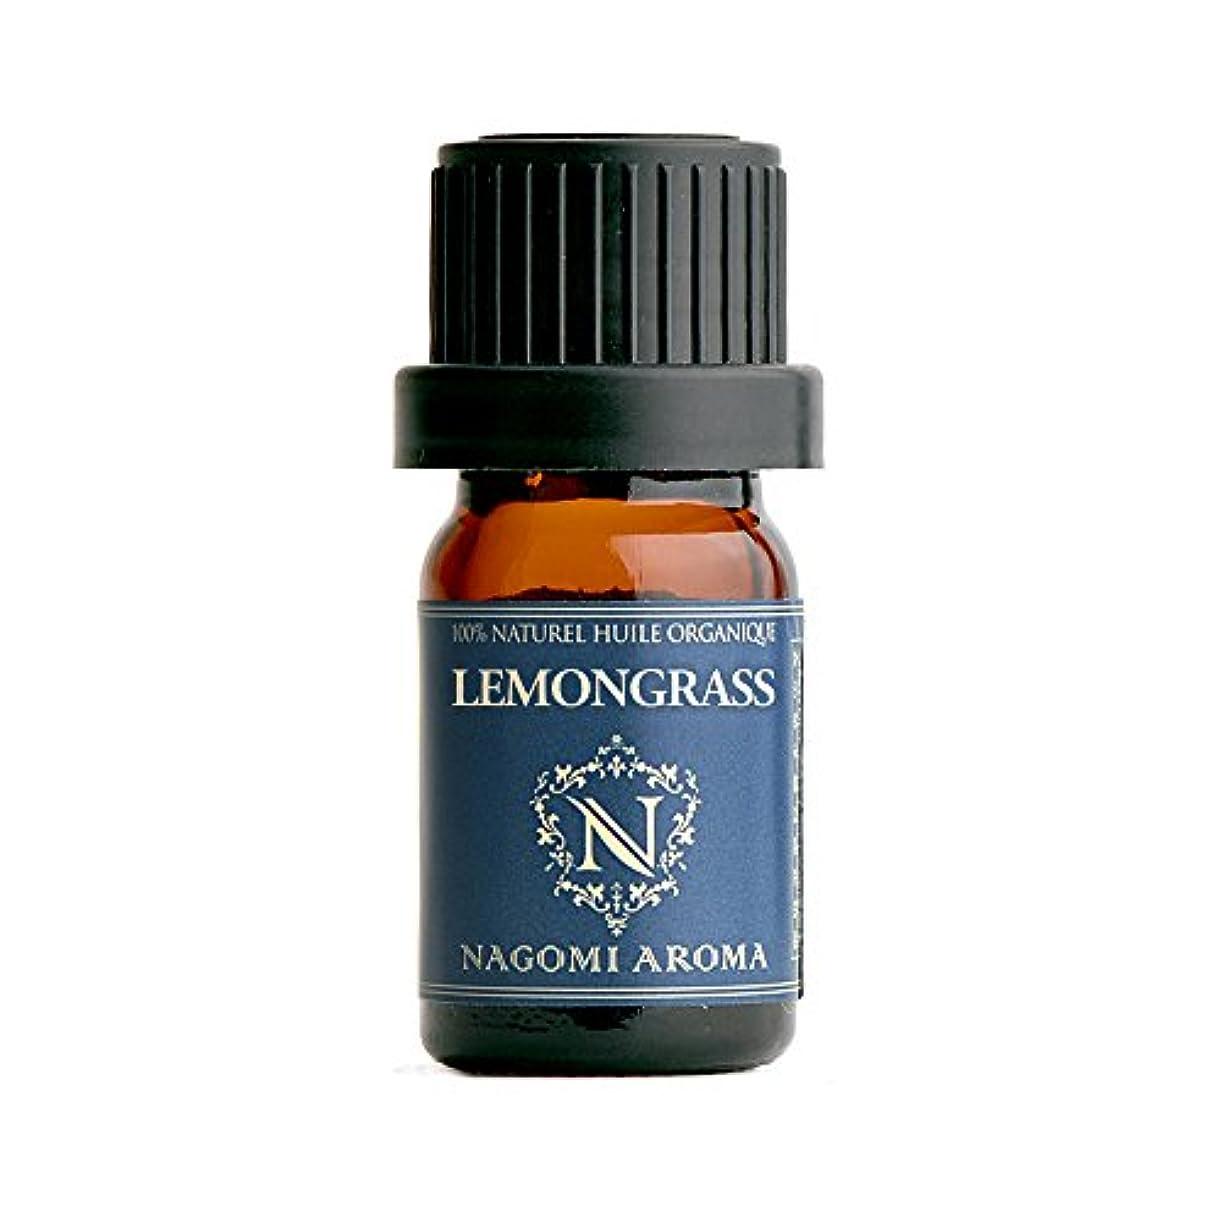 NAGOMI AROMA オーガニック レモングラス 5ml 【AEAJ認定精油】【アロマオイル】